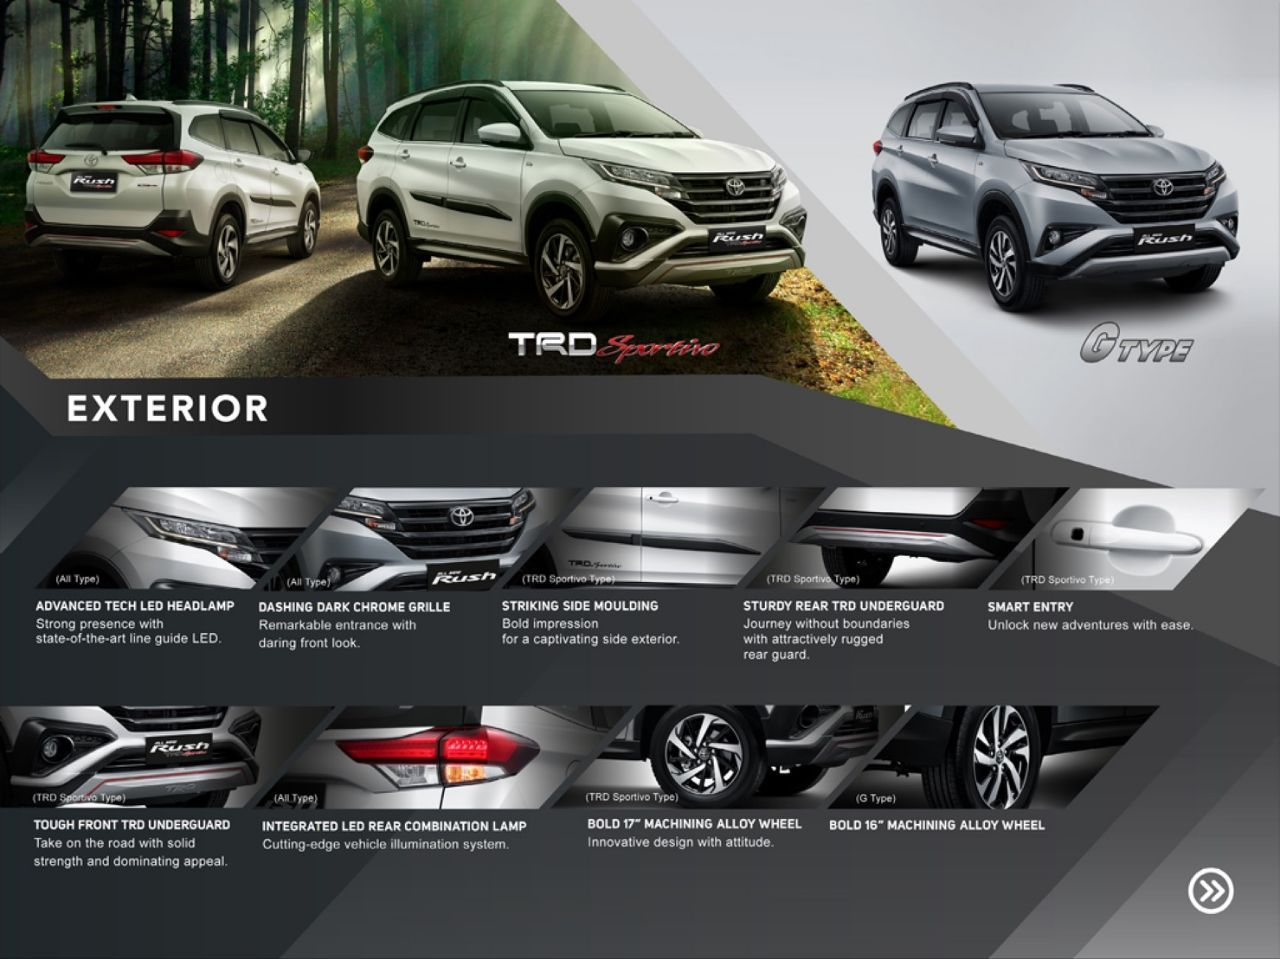 All New Toyota Alphard 2018 Indonesia Corolla Altis 2019 Brosur Harga Mobil Rush Semarang